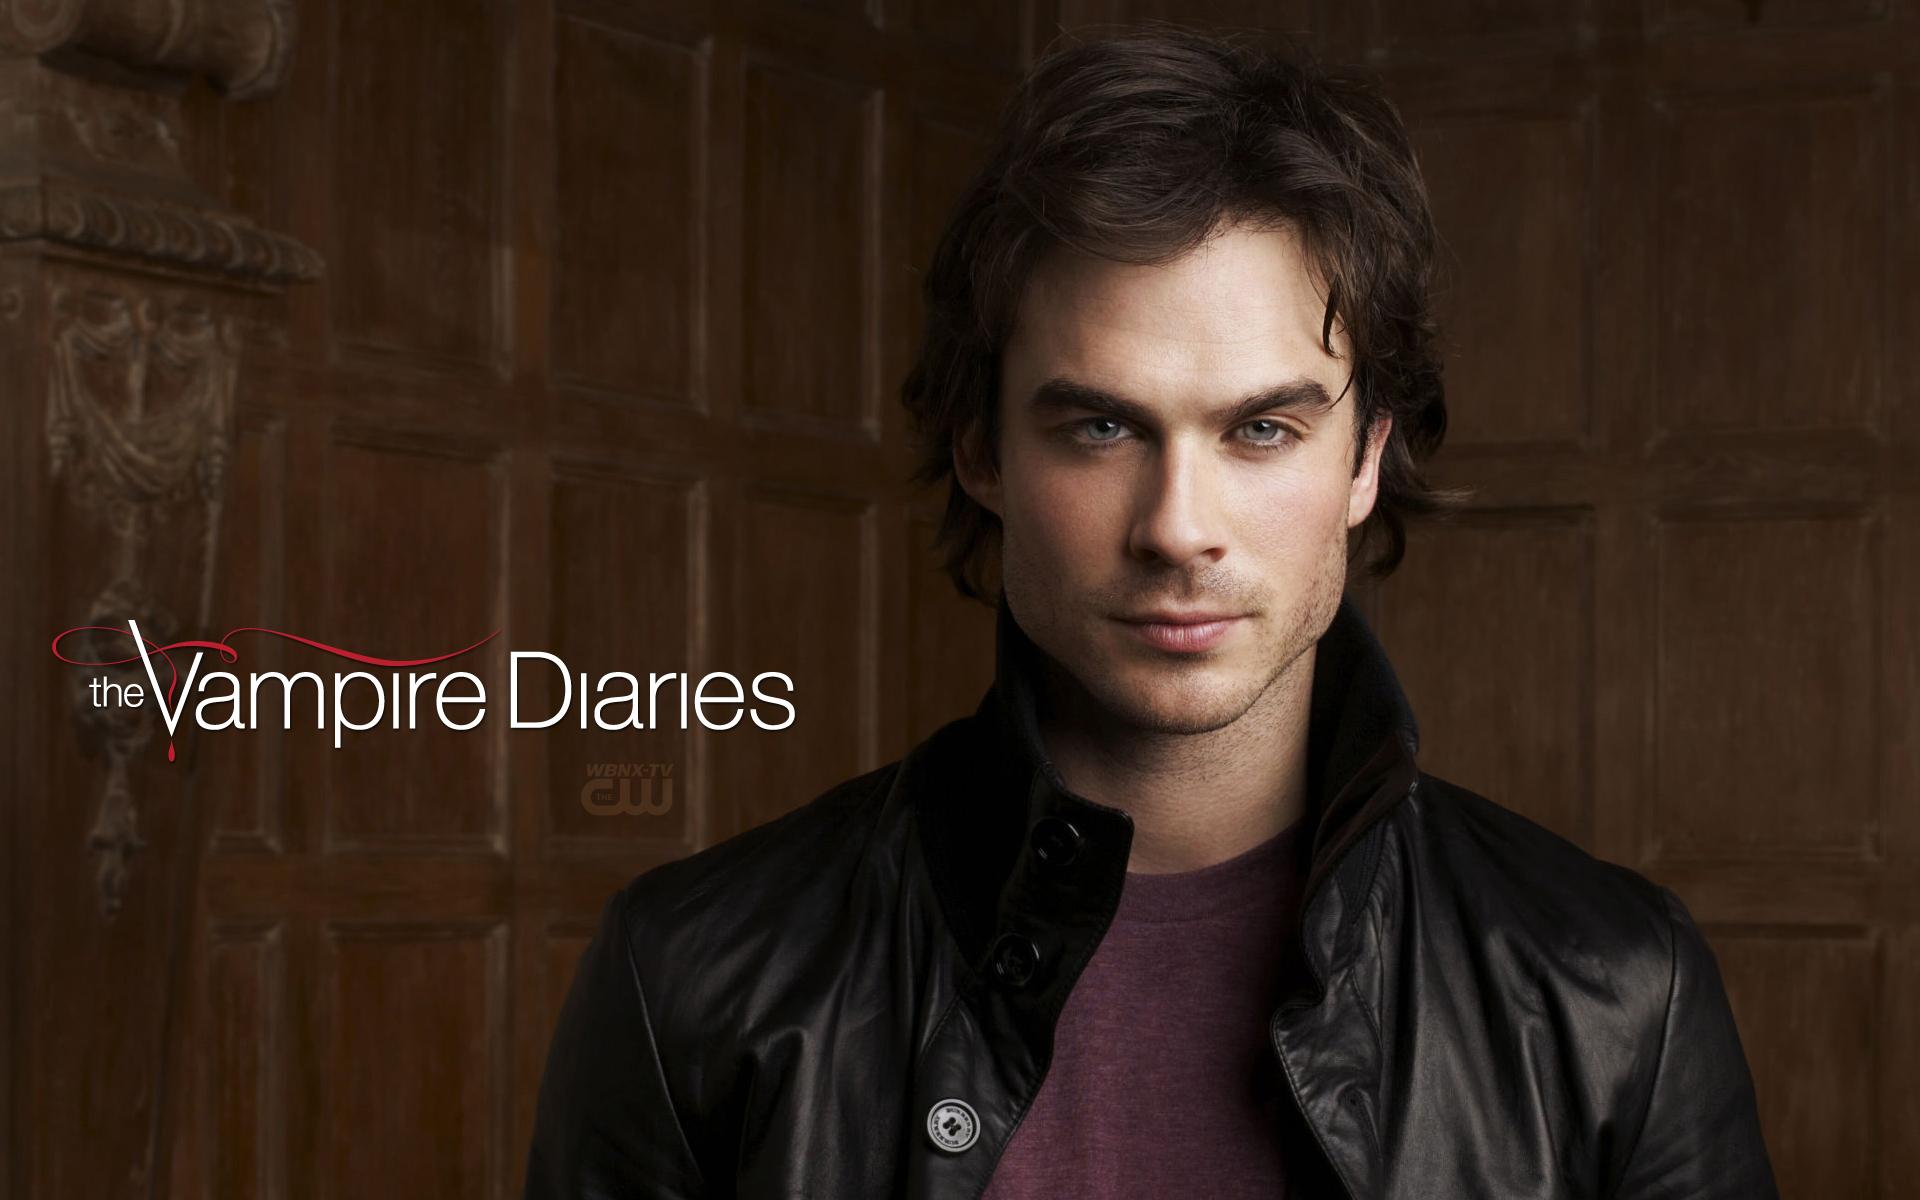 The Vampire Diaries S1 Damon   WBNX TV Clevelands CW 1920x1200